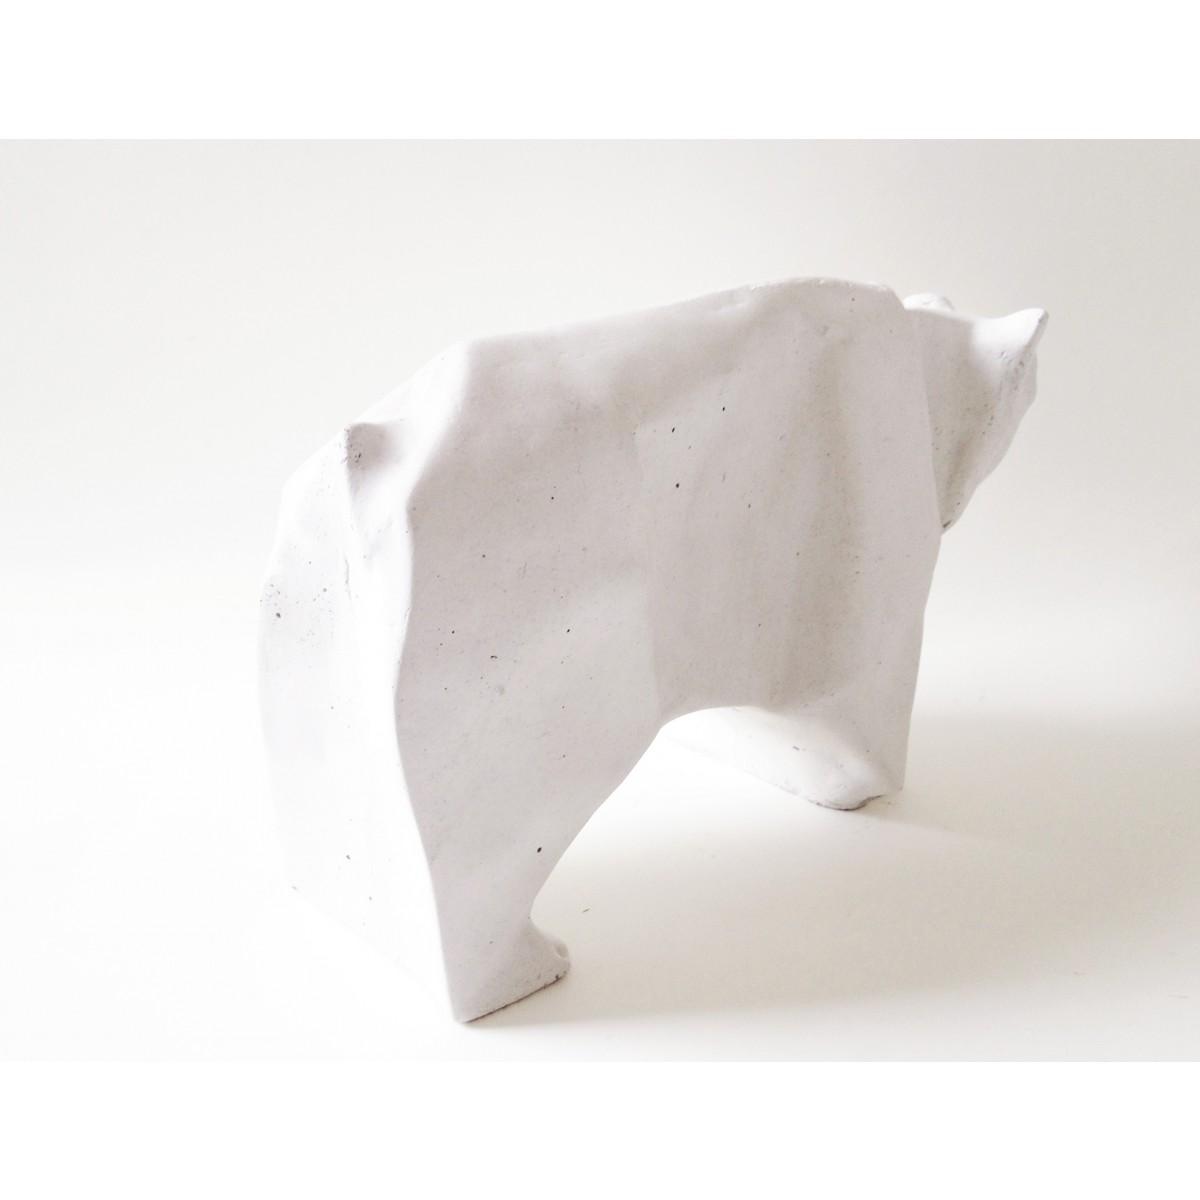 Origami Eisbär aus Beton